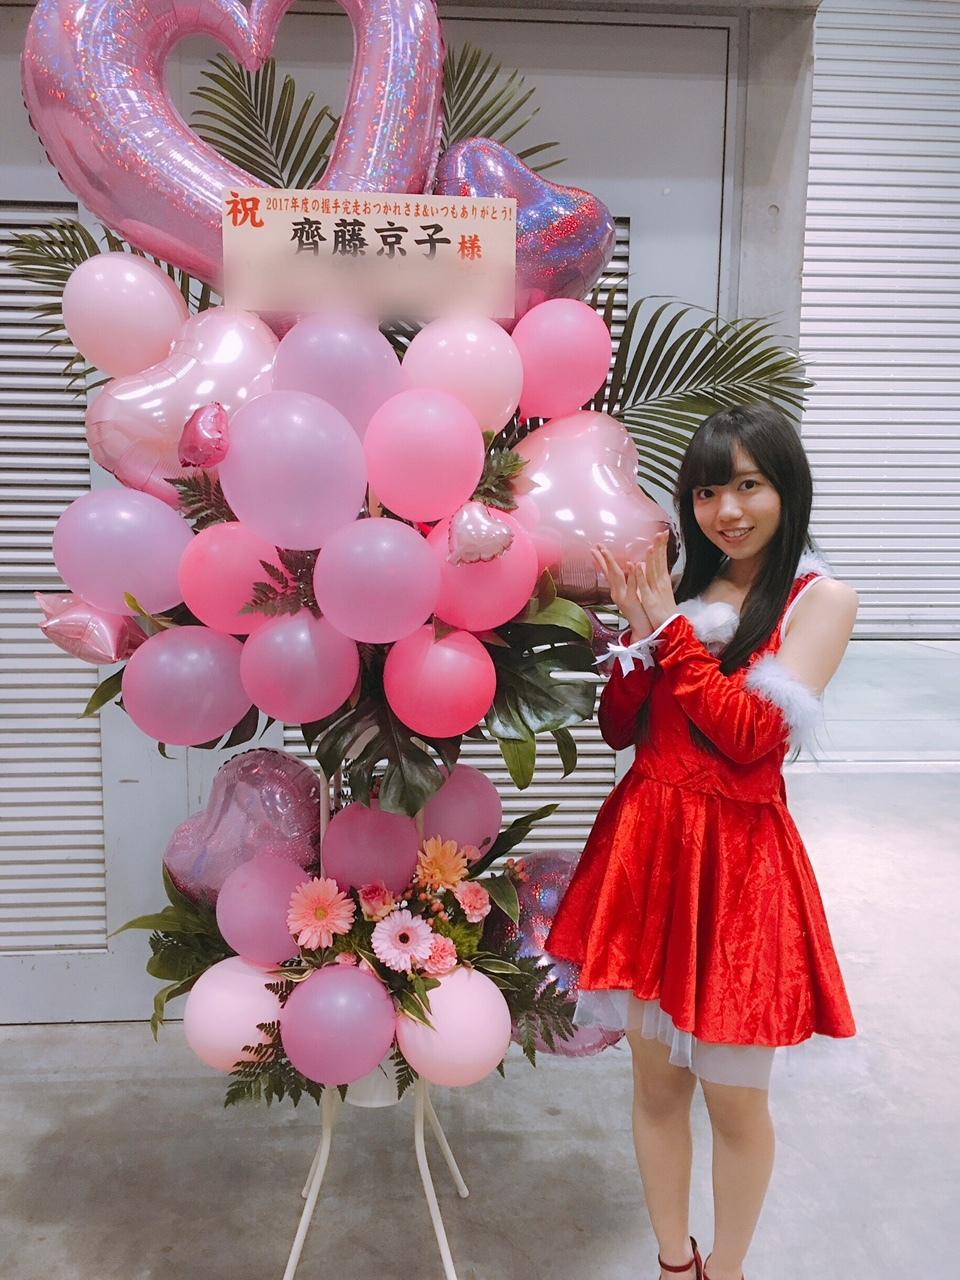 http://cdn.keyakizaka46.com/files/14/diary/k46/member/moblog/201711/moba4oO3t.jpg